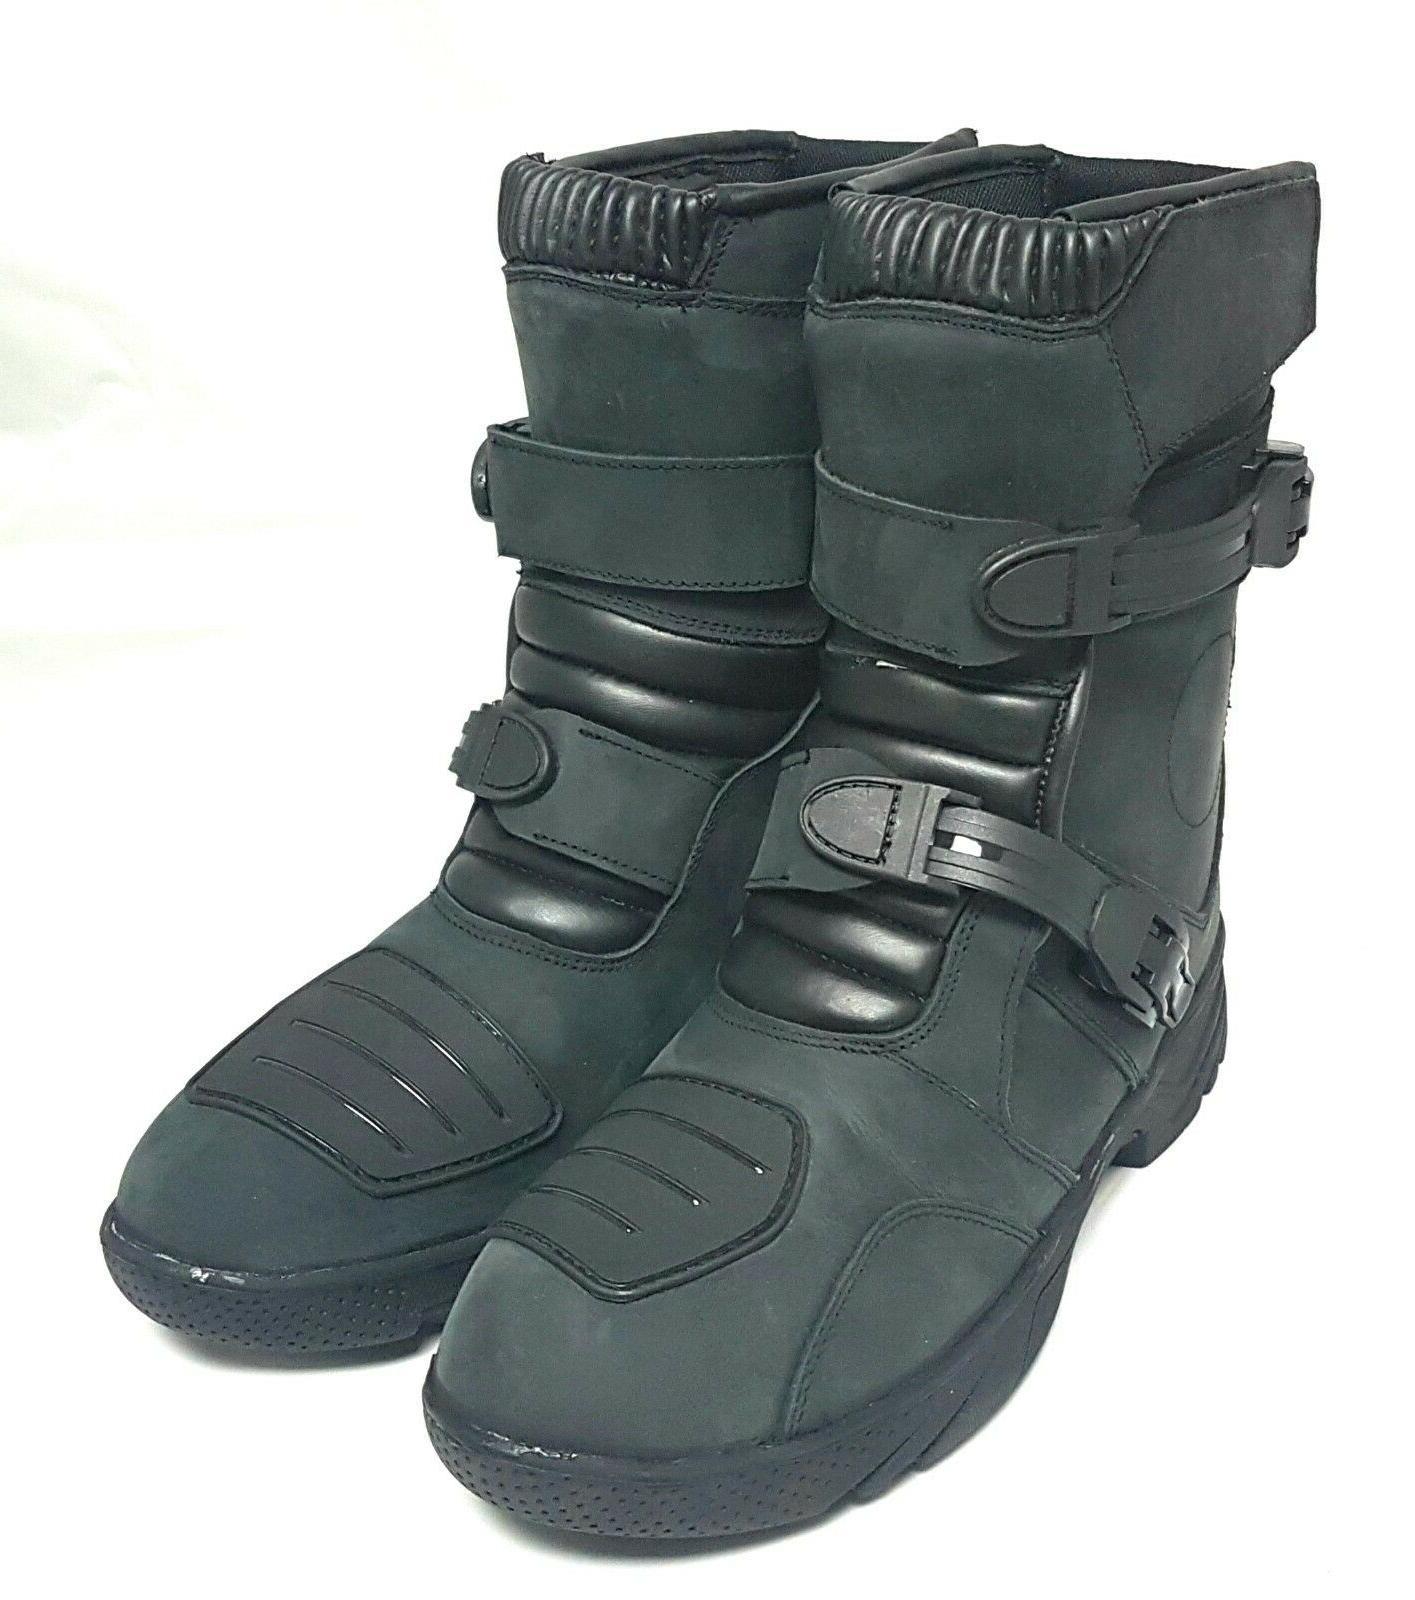 altimate Adventure boots, dual